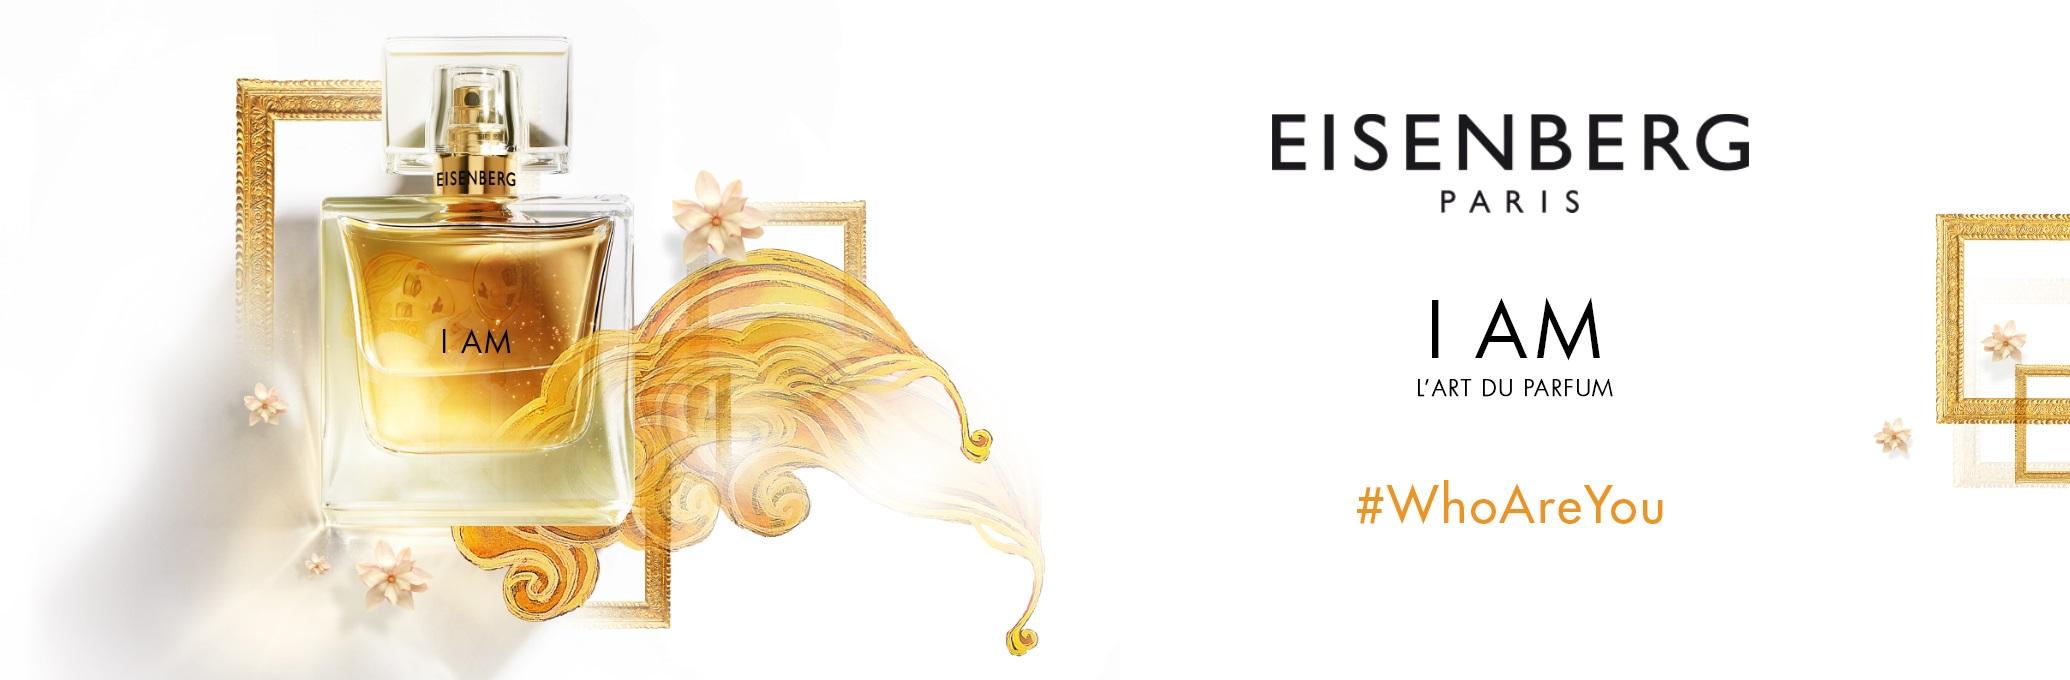 a9d223e5bb1048 EISENBERG Paris – perfume, makeup | notino.co.uk